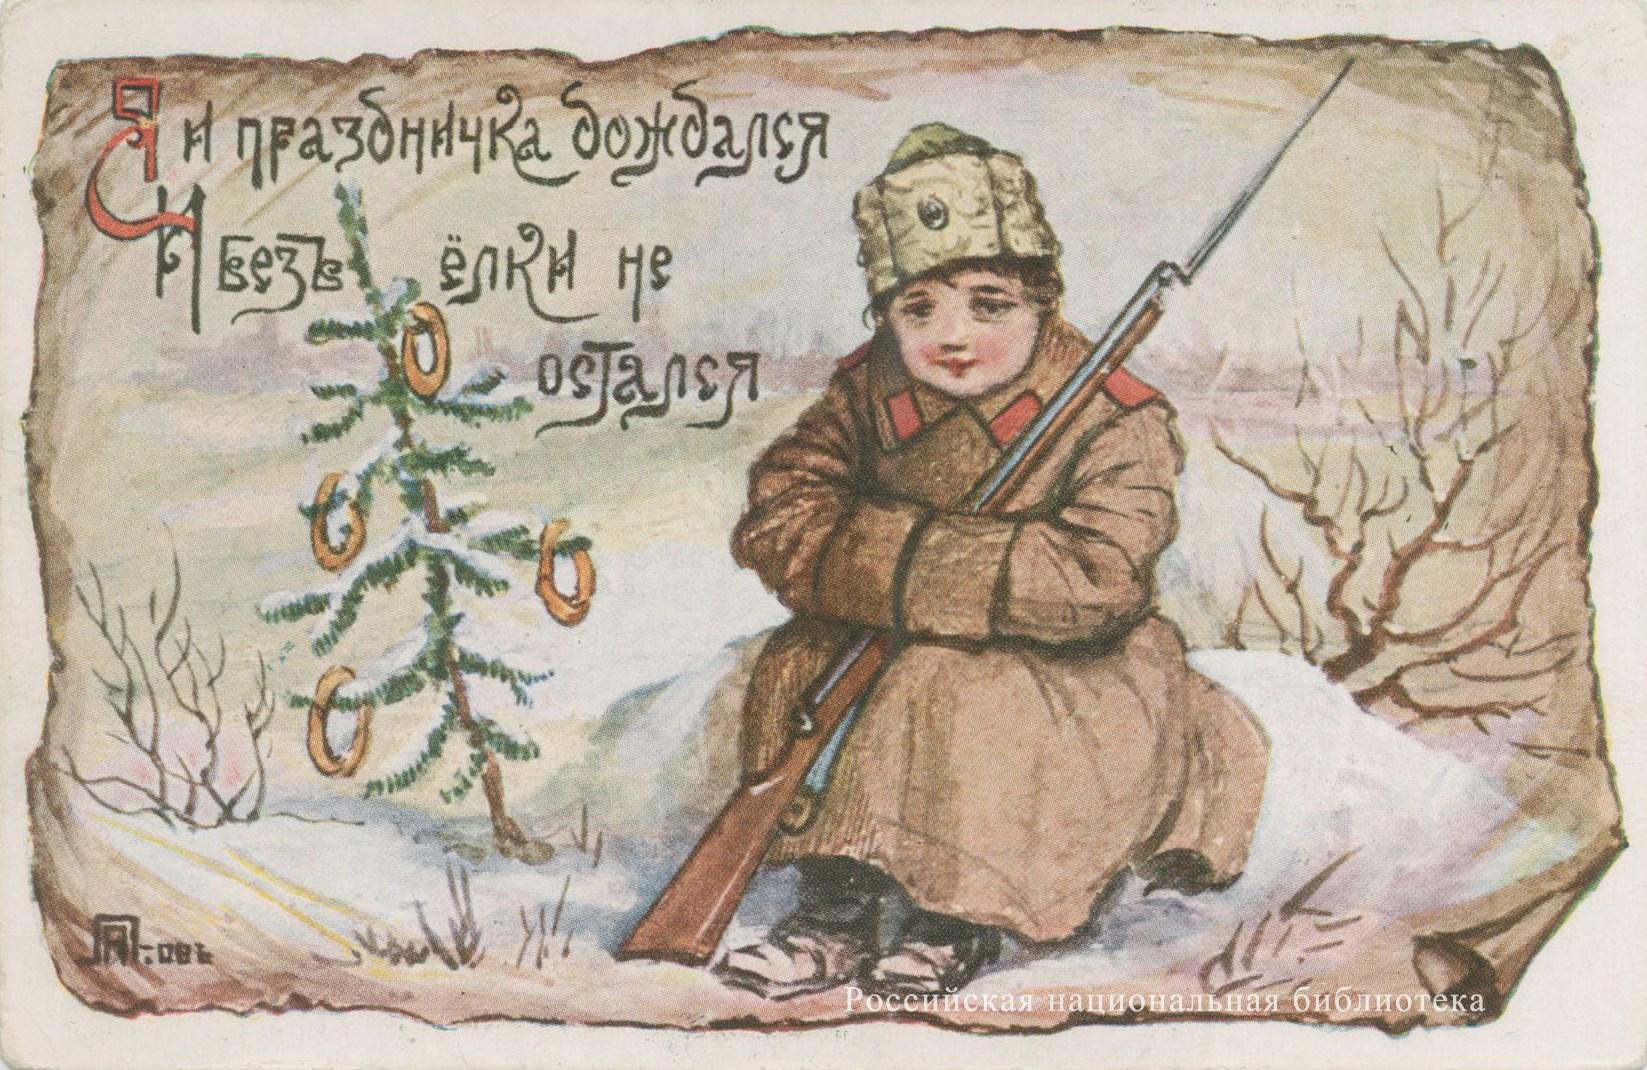 Море картинки, ретро открытка военная